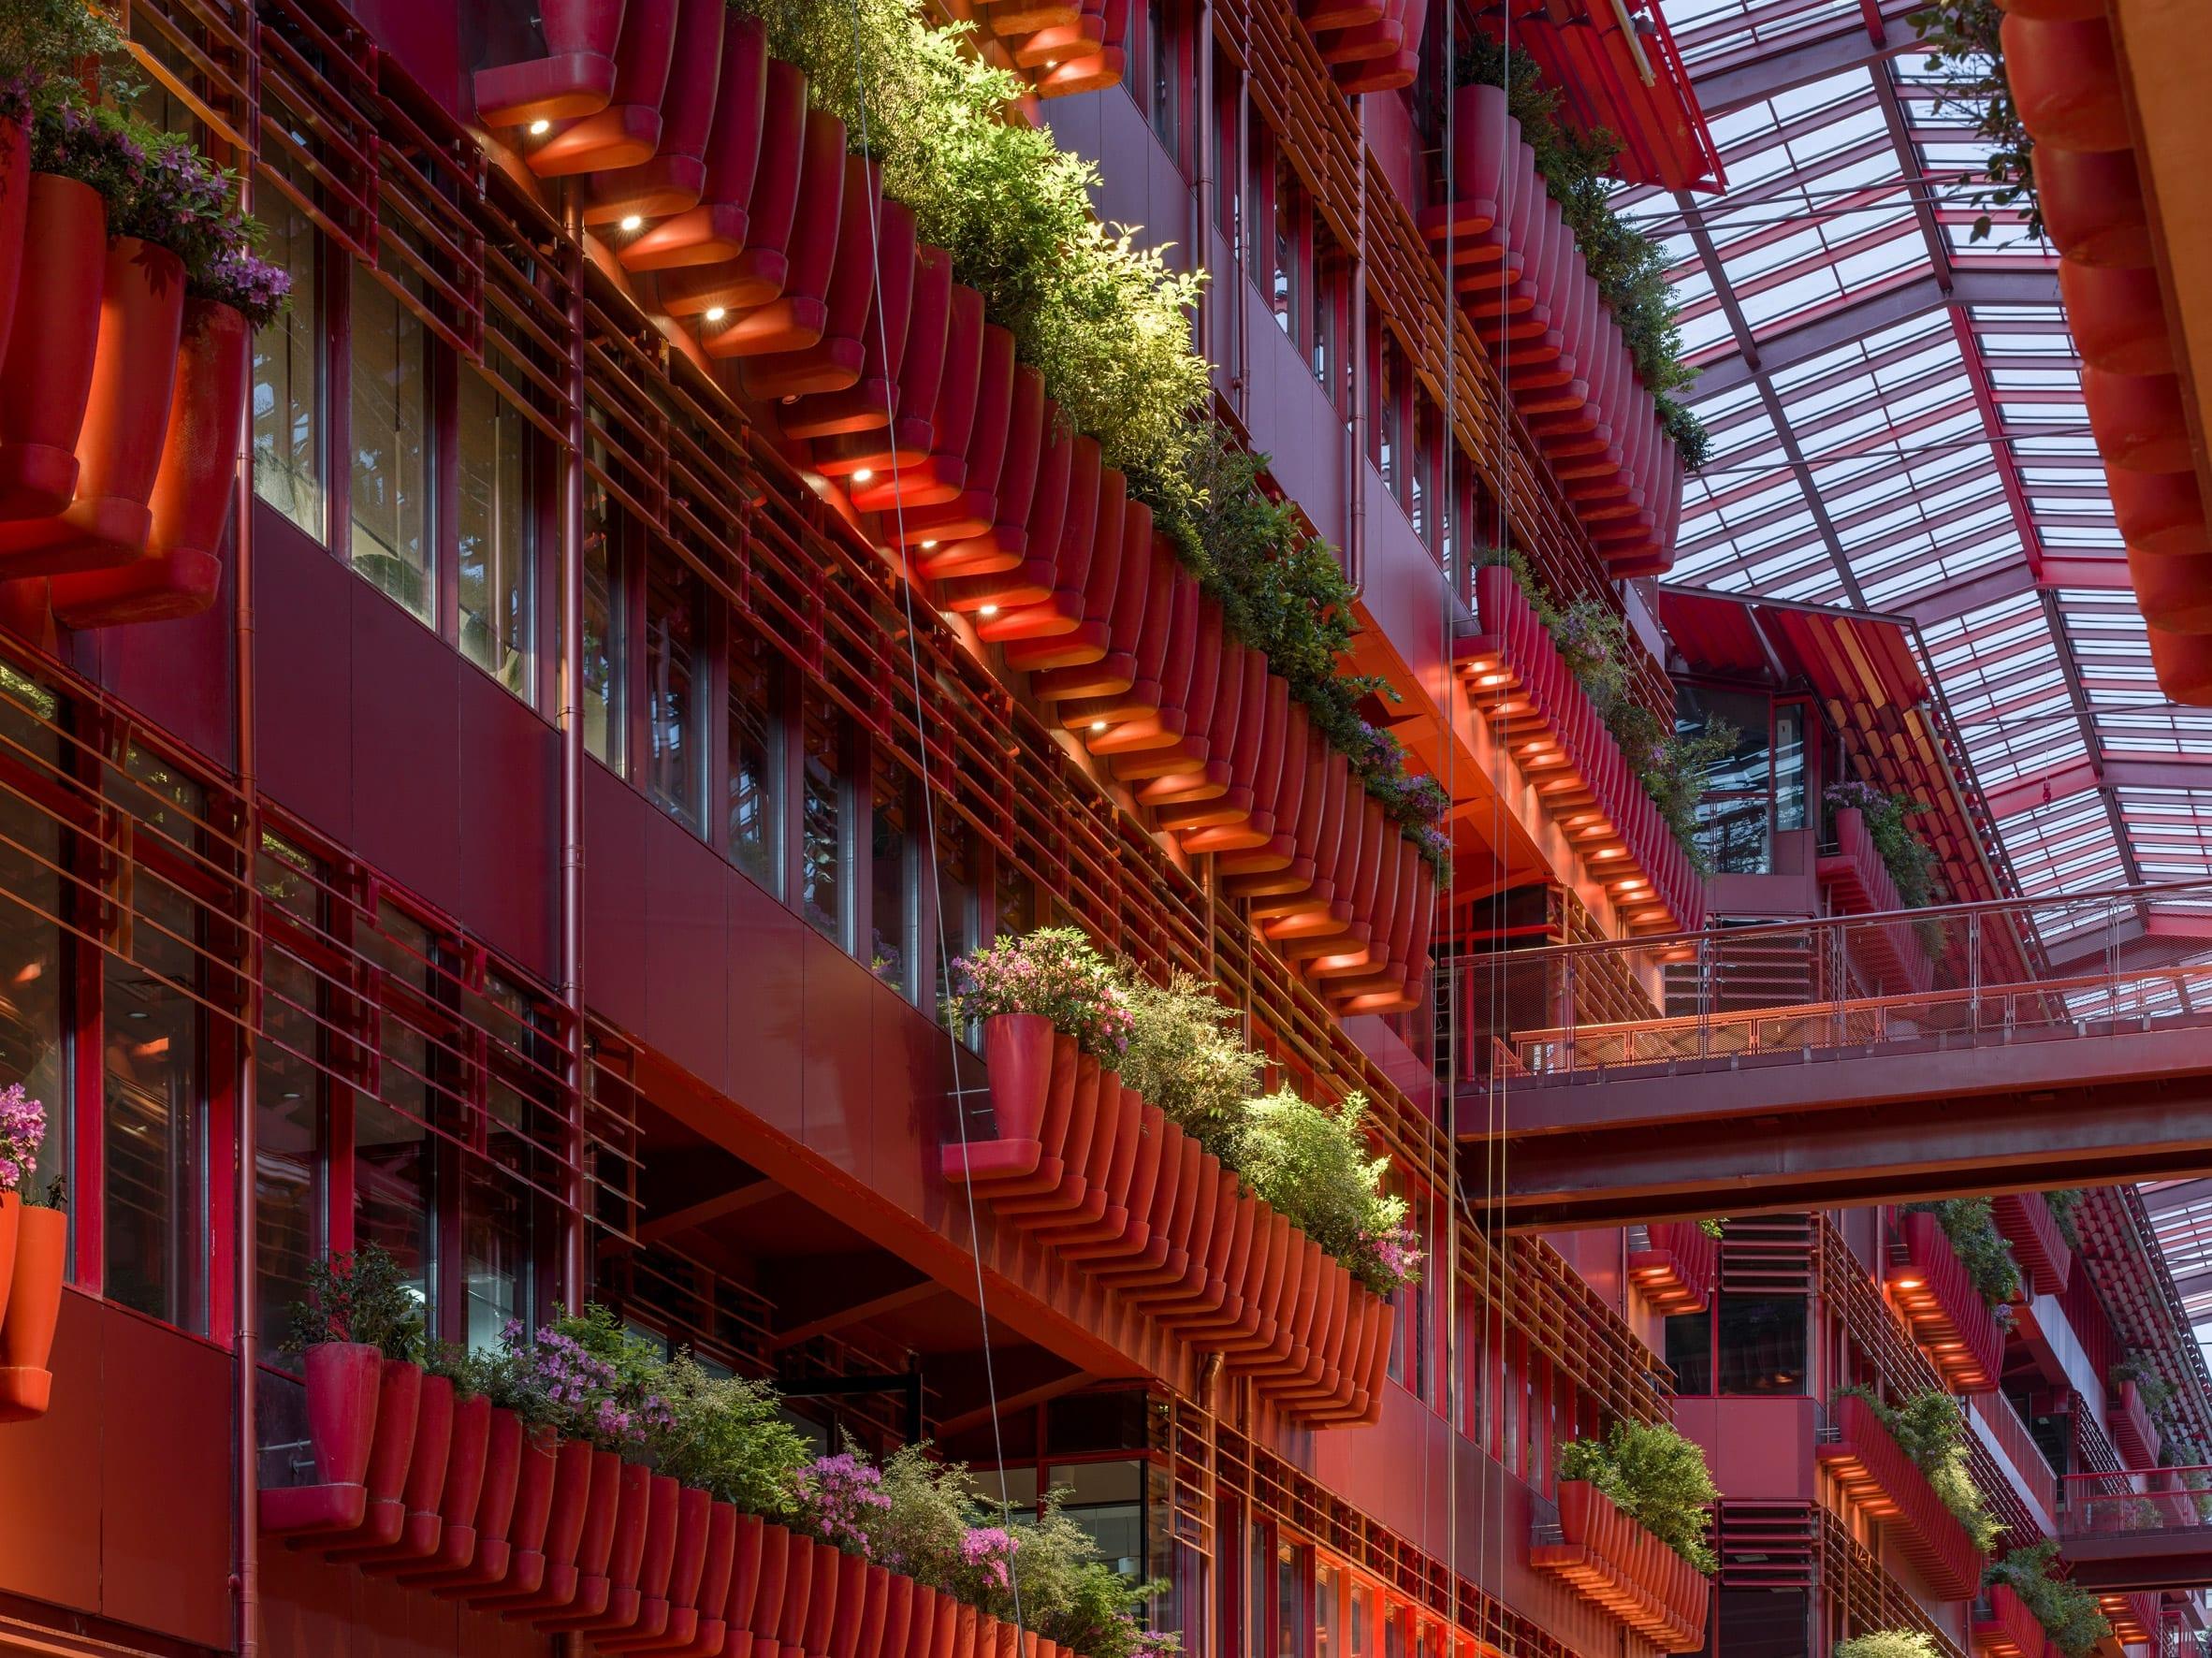 The Henderson CIFI Tiandi building has a bright red finish